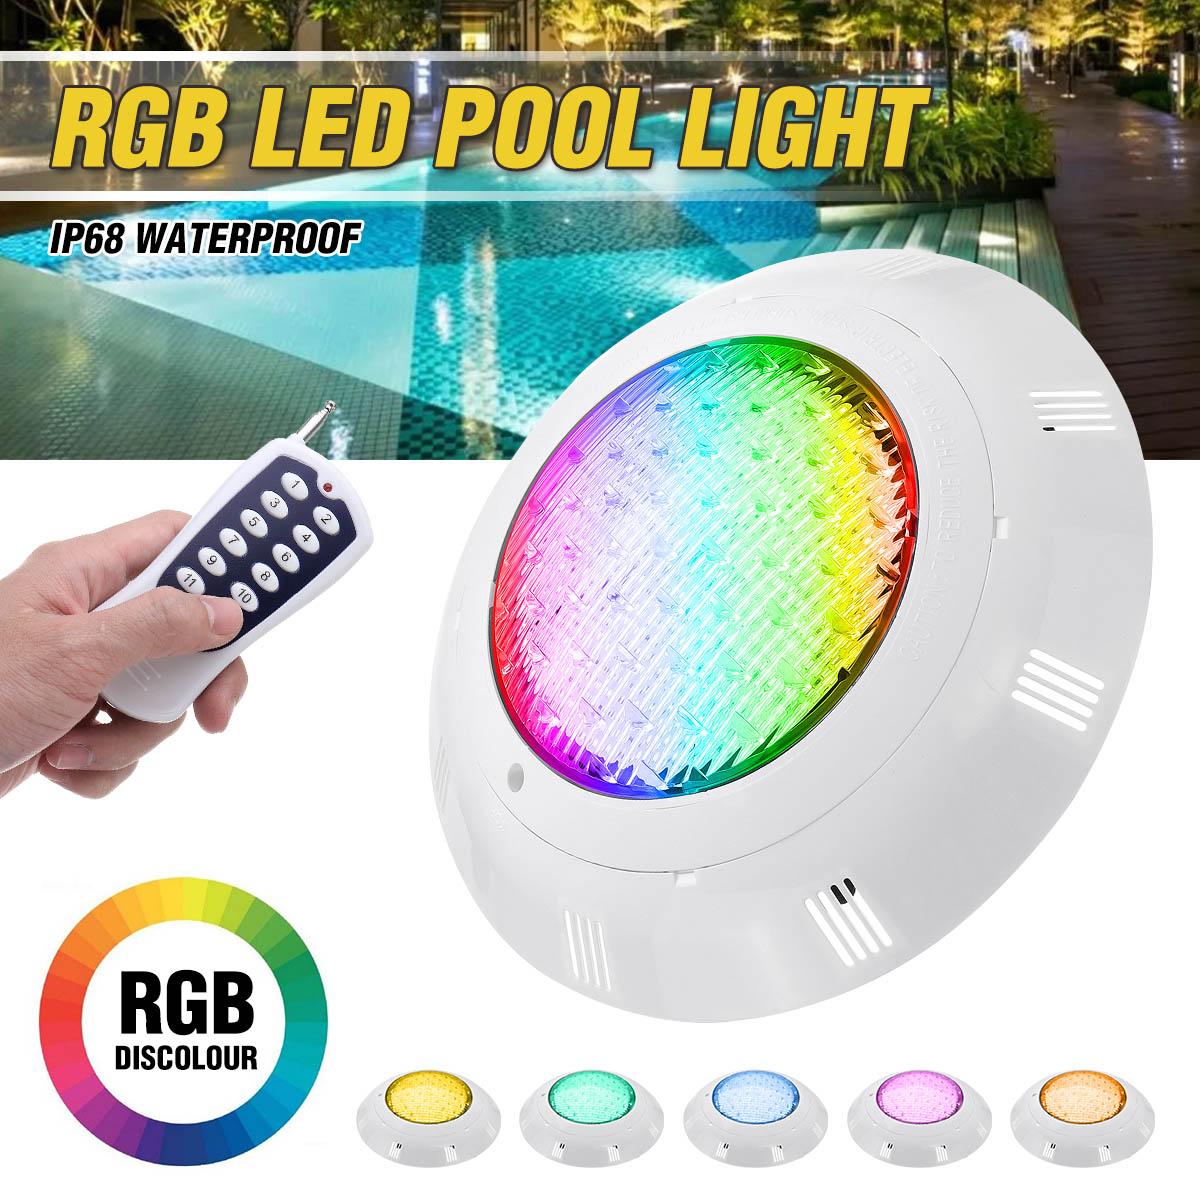 45W RGB Led Luz de Piscina 450LED IP68 impermeable AC/DC12V-24V al aire libre RGB luz subacuática estanque Led Piscina foco de luz 30A LED atenuador de color único DC12V-24V 11Key de RF para Dimmer de RF de atenuación, controlador de Control para 5050 de 3528 cinta de LED de único color 1pc